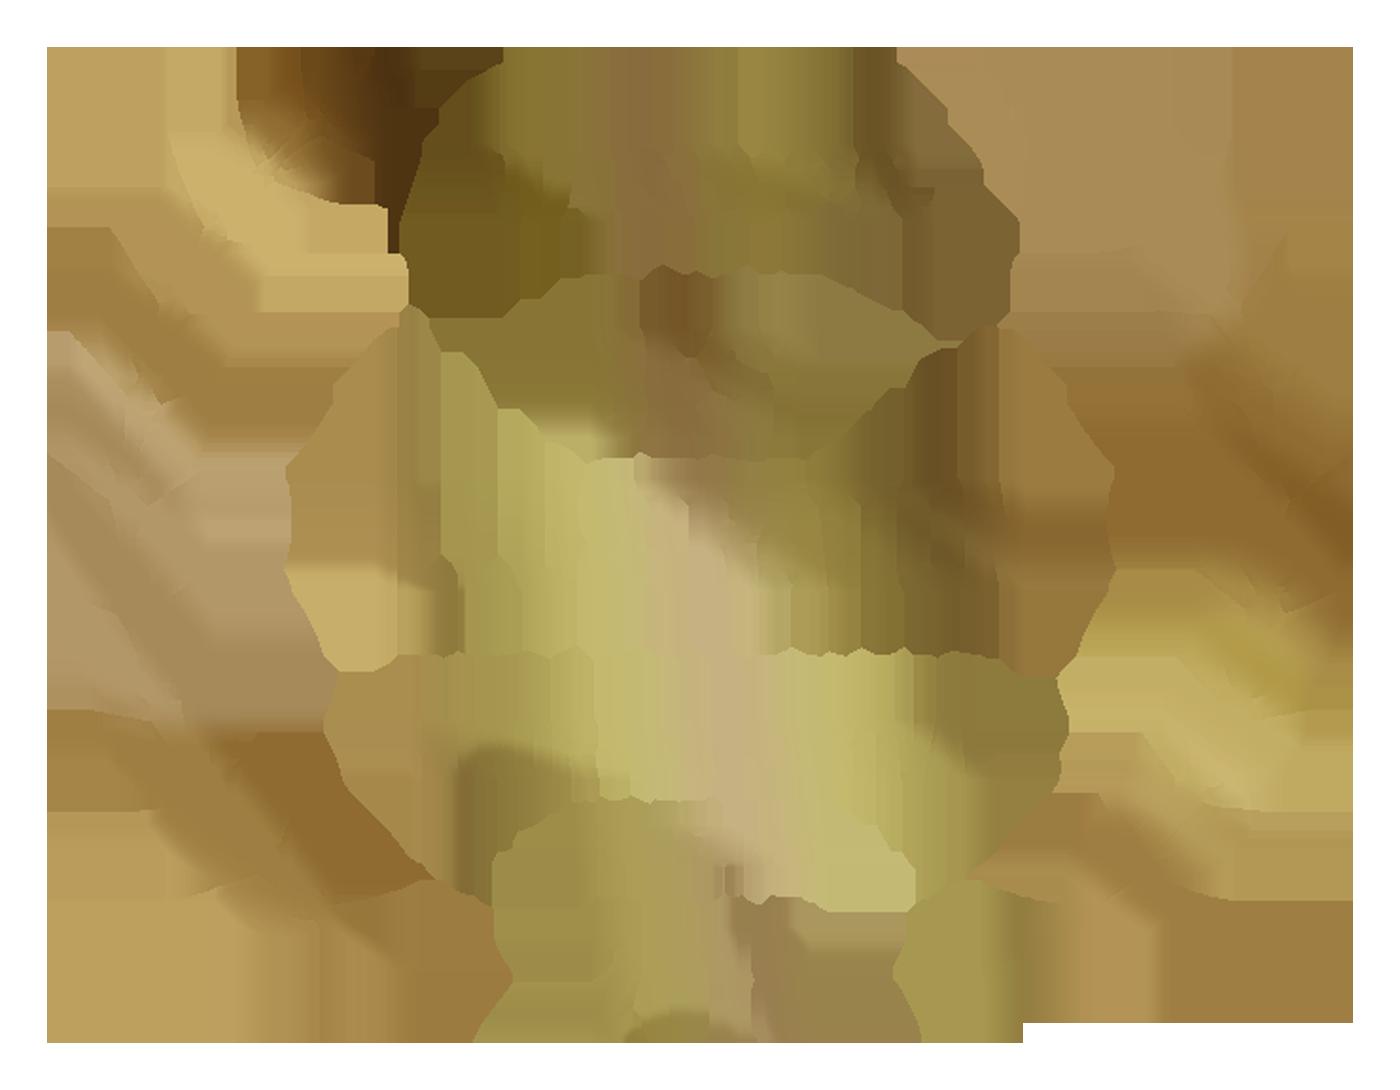 FragmentsBest Illustration Honor Film Festival September 2018 Design & Illustration by Cesare Asaro